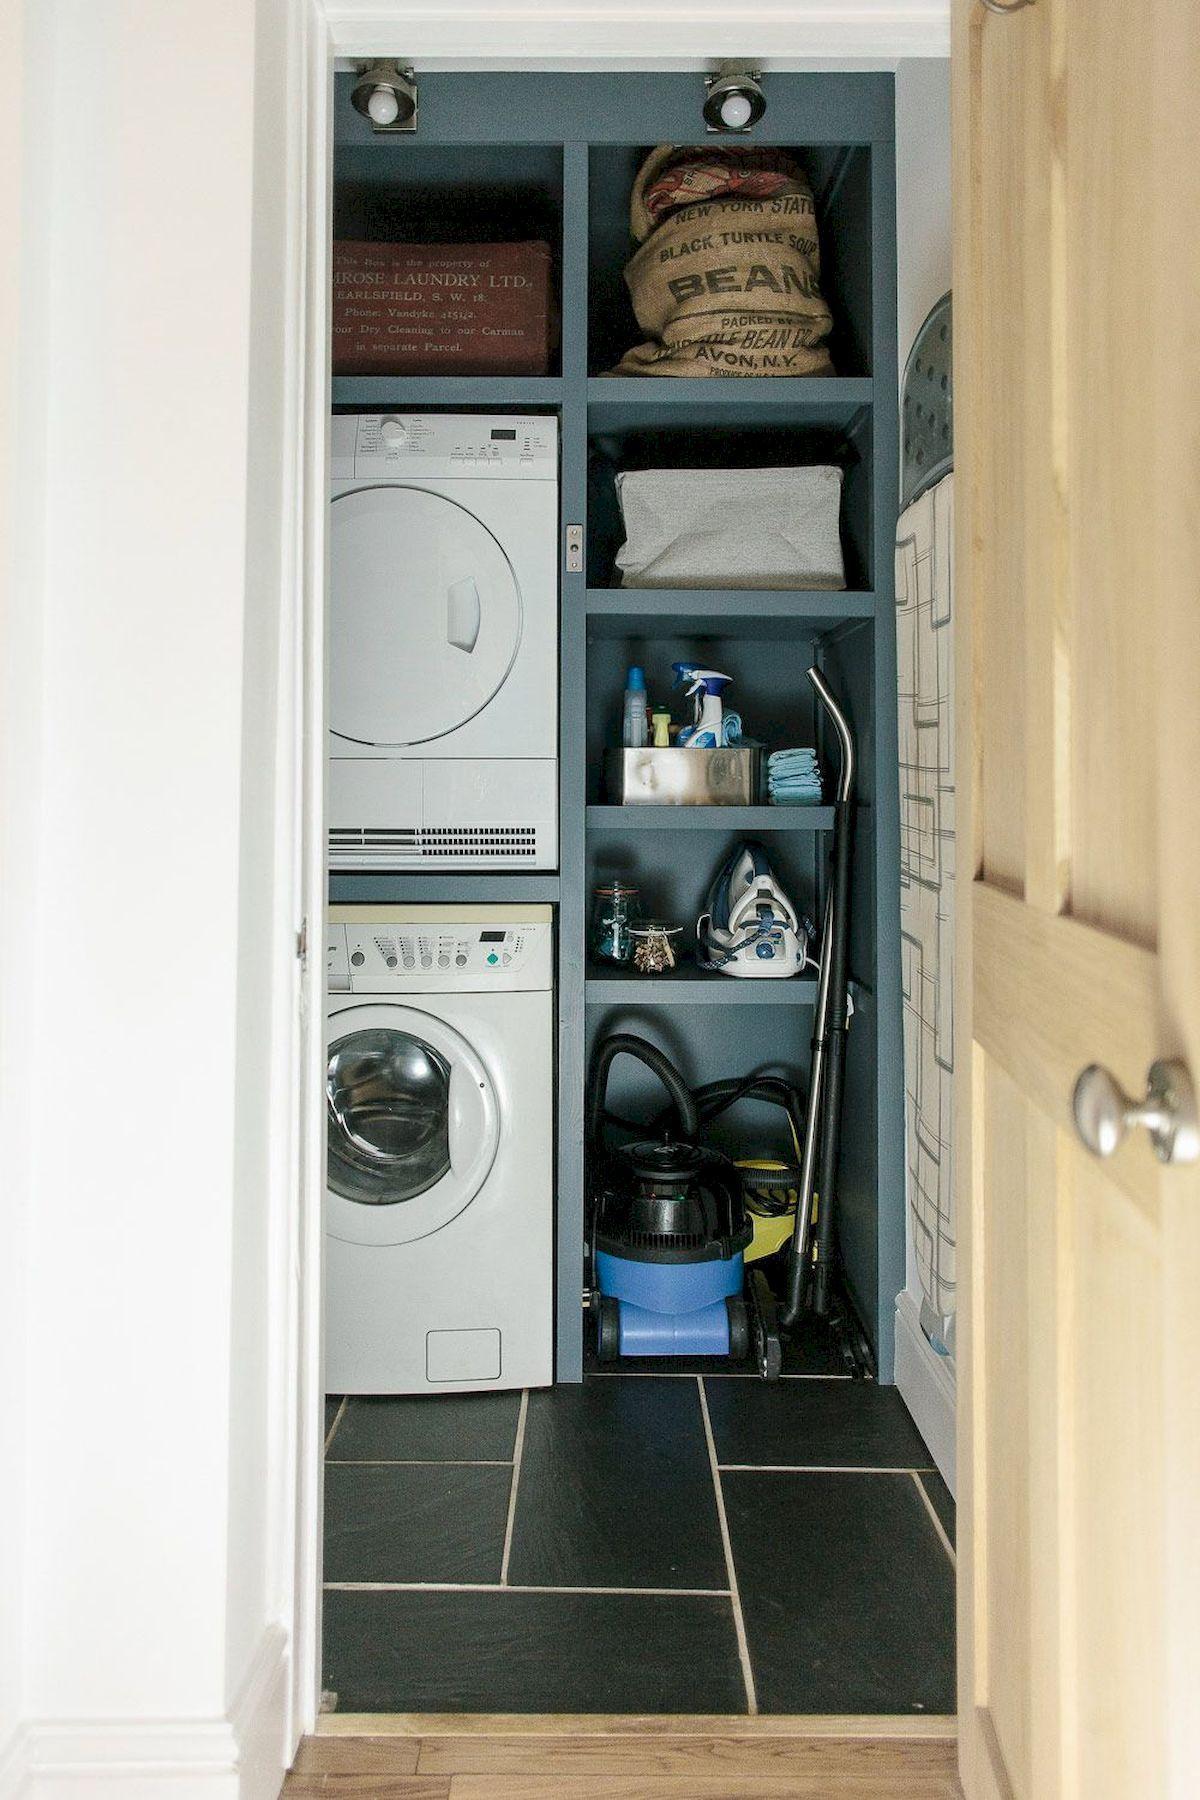 Marvelous Laundry Room With Best Storage Ideas Jihanshanum Utility Room Storage Small Utility Room Utility Room Designs